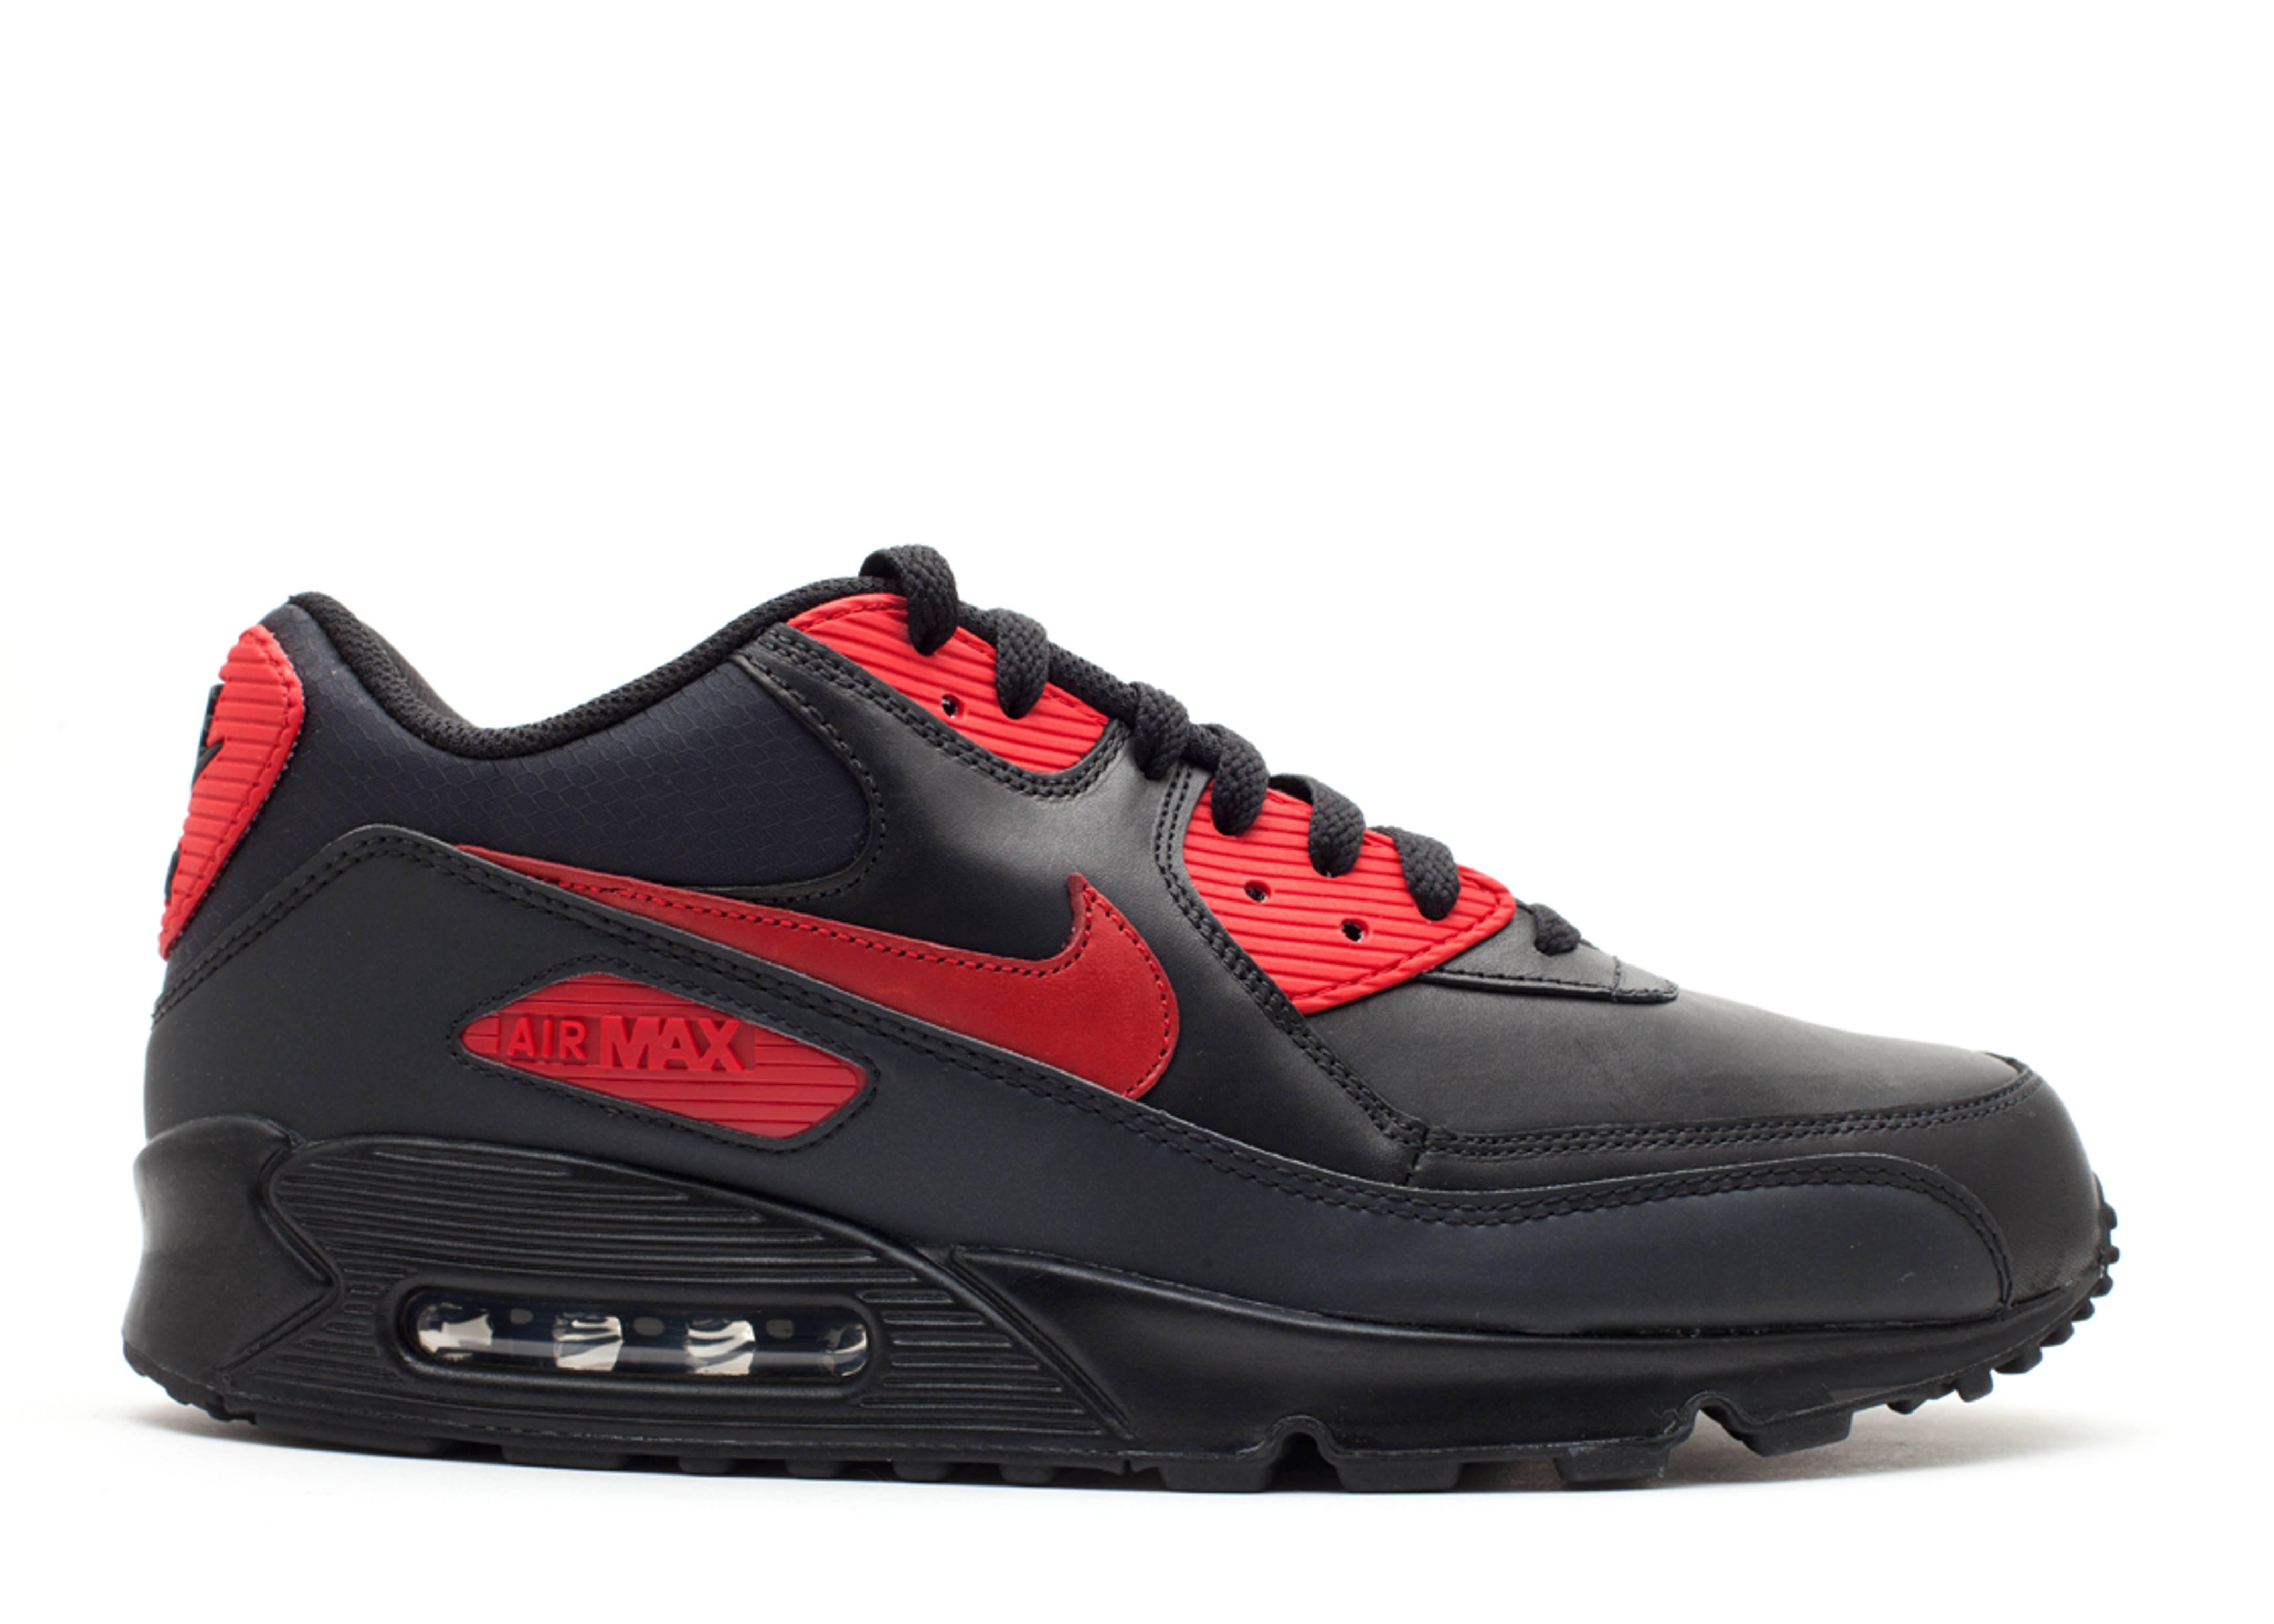 c04d7eb9e344 Air Max 90 Premium - Nike - 333888 006 - black black-varsity red ...